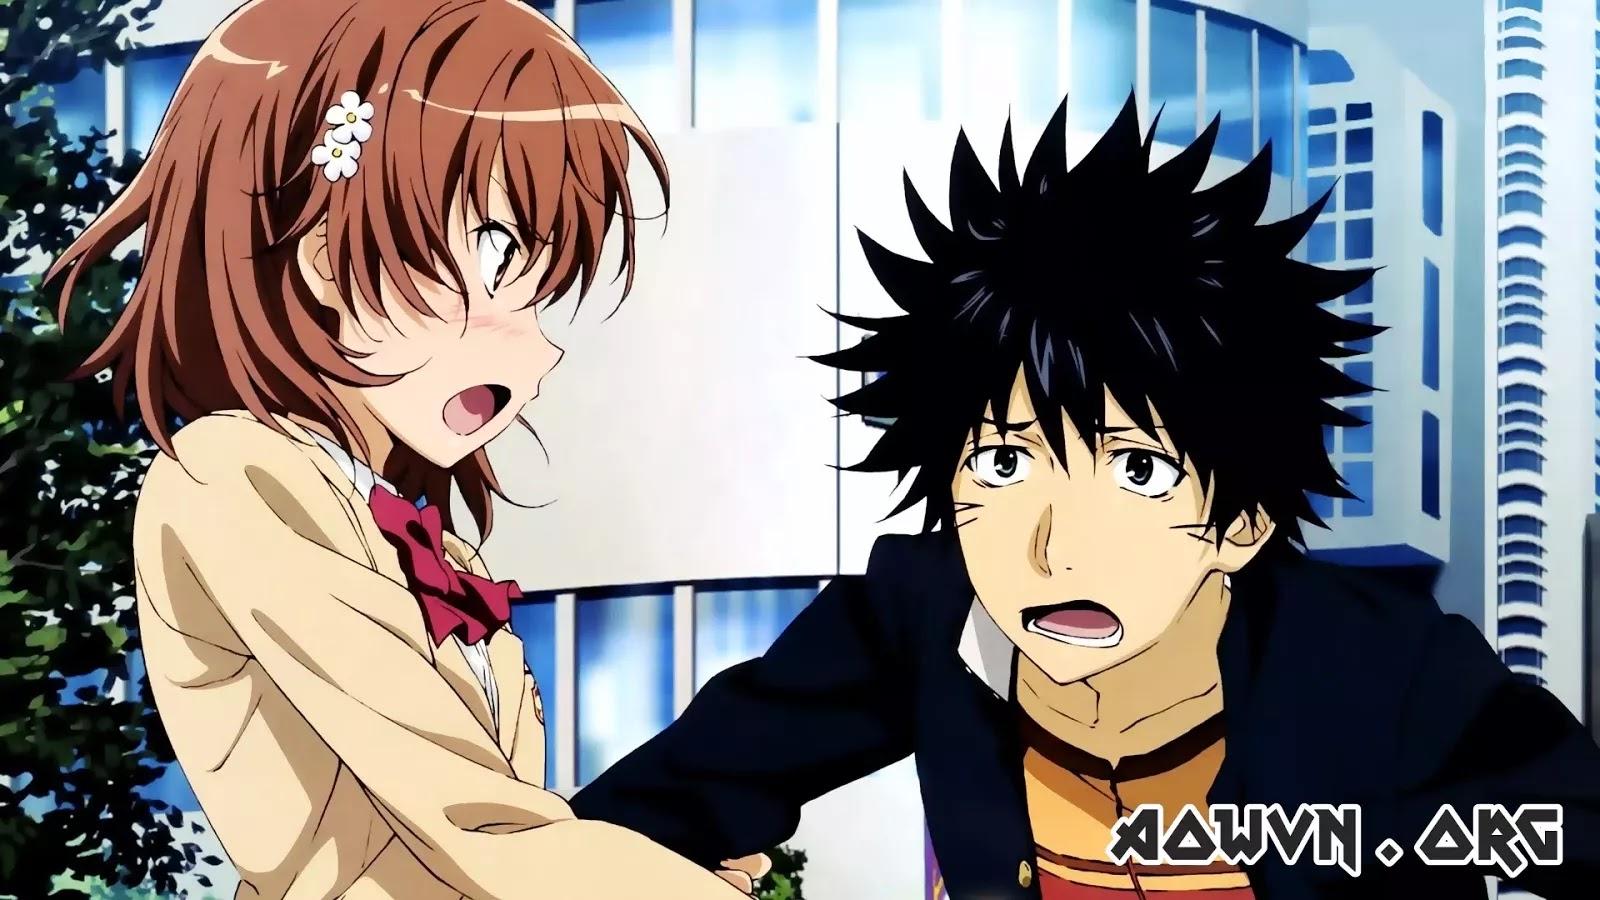 Toaru AowVN m%2B%25282%2529 - [ Anime 3gp Mp4 ] Toaru Majutsu No Index Season 1 + Season 2 | Vietsub – Anime pháp thuật tuyệt đỉnh